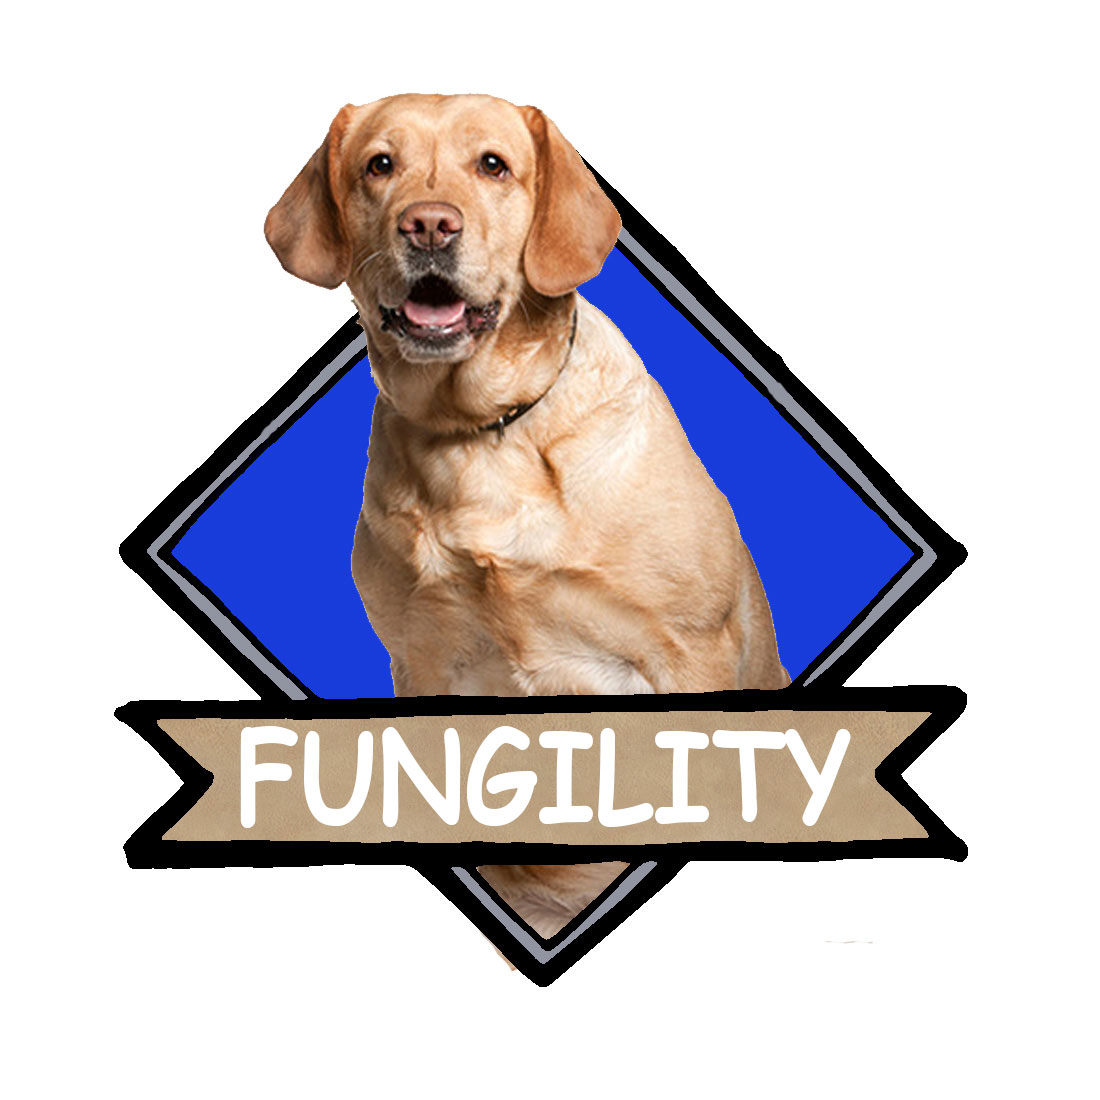 Fungility